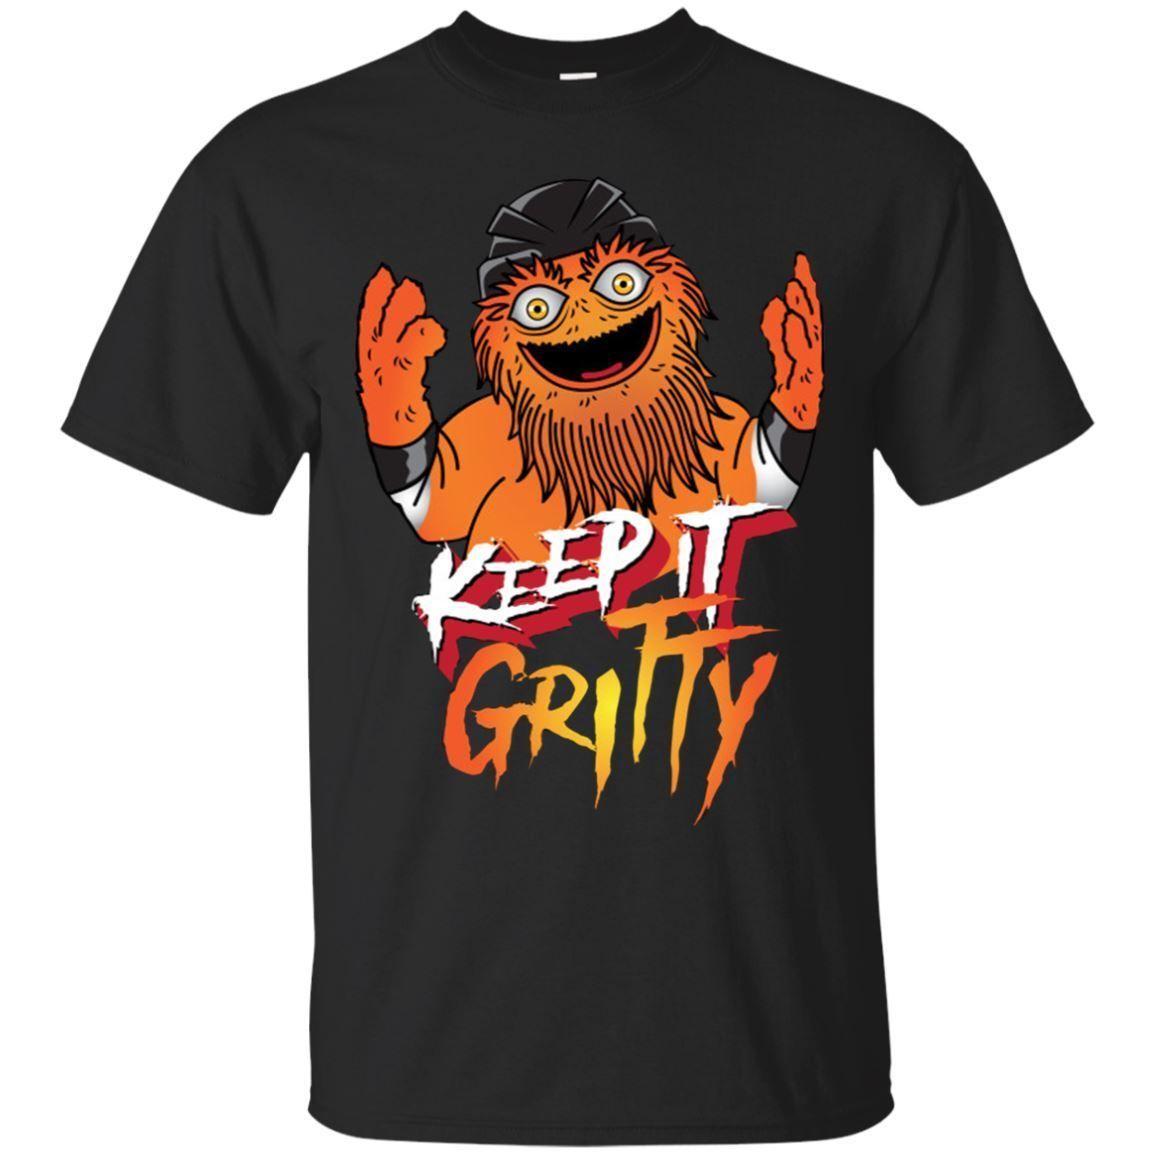 bf13c29de Keep It Gritty Hockey Black Tshirt For Men Gritty Philadelphia Hockey  Mascot Tee T Shirt Shop Design Crazy T Shirts Online From  Beautifulfuture56